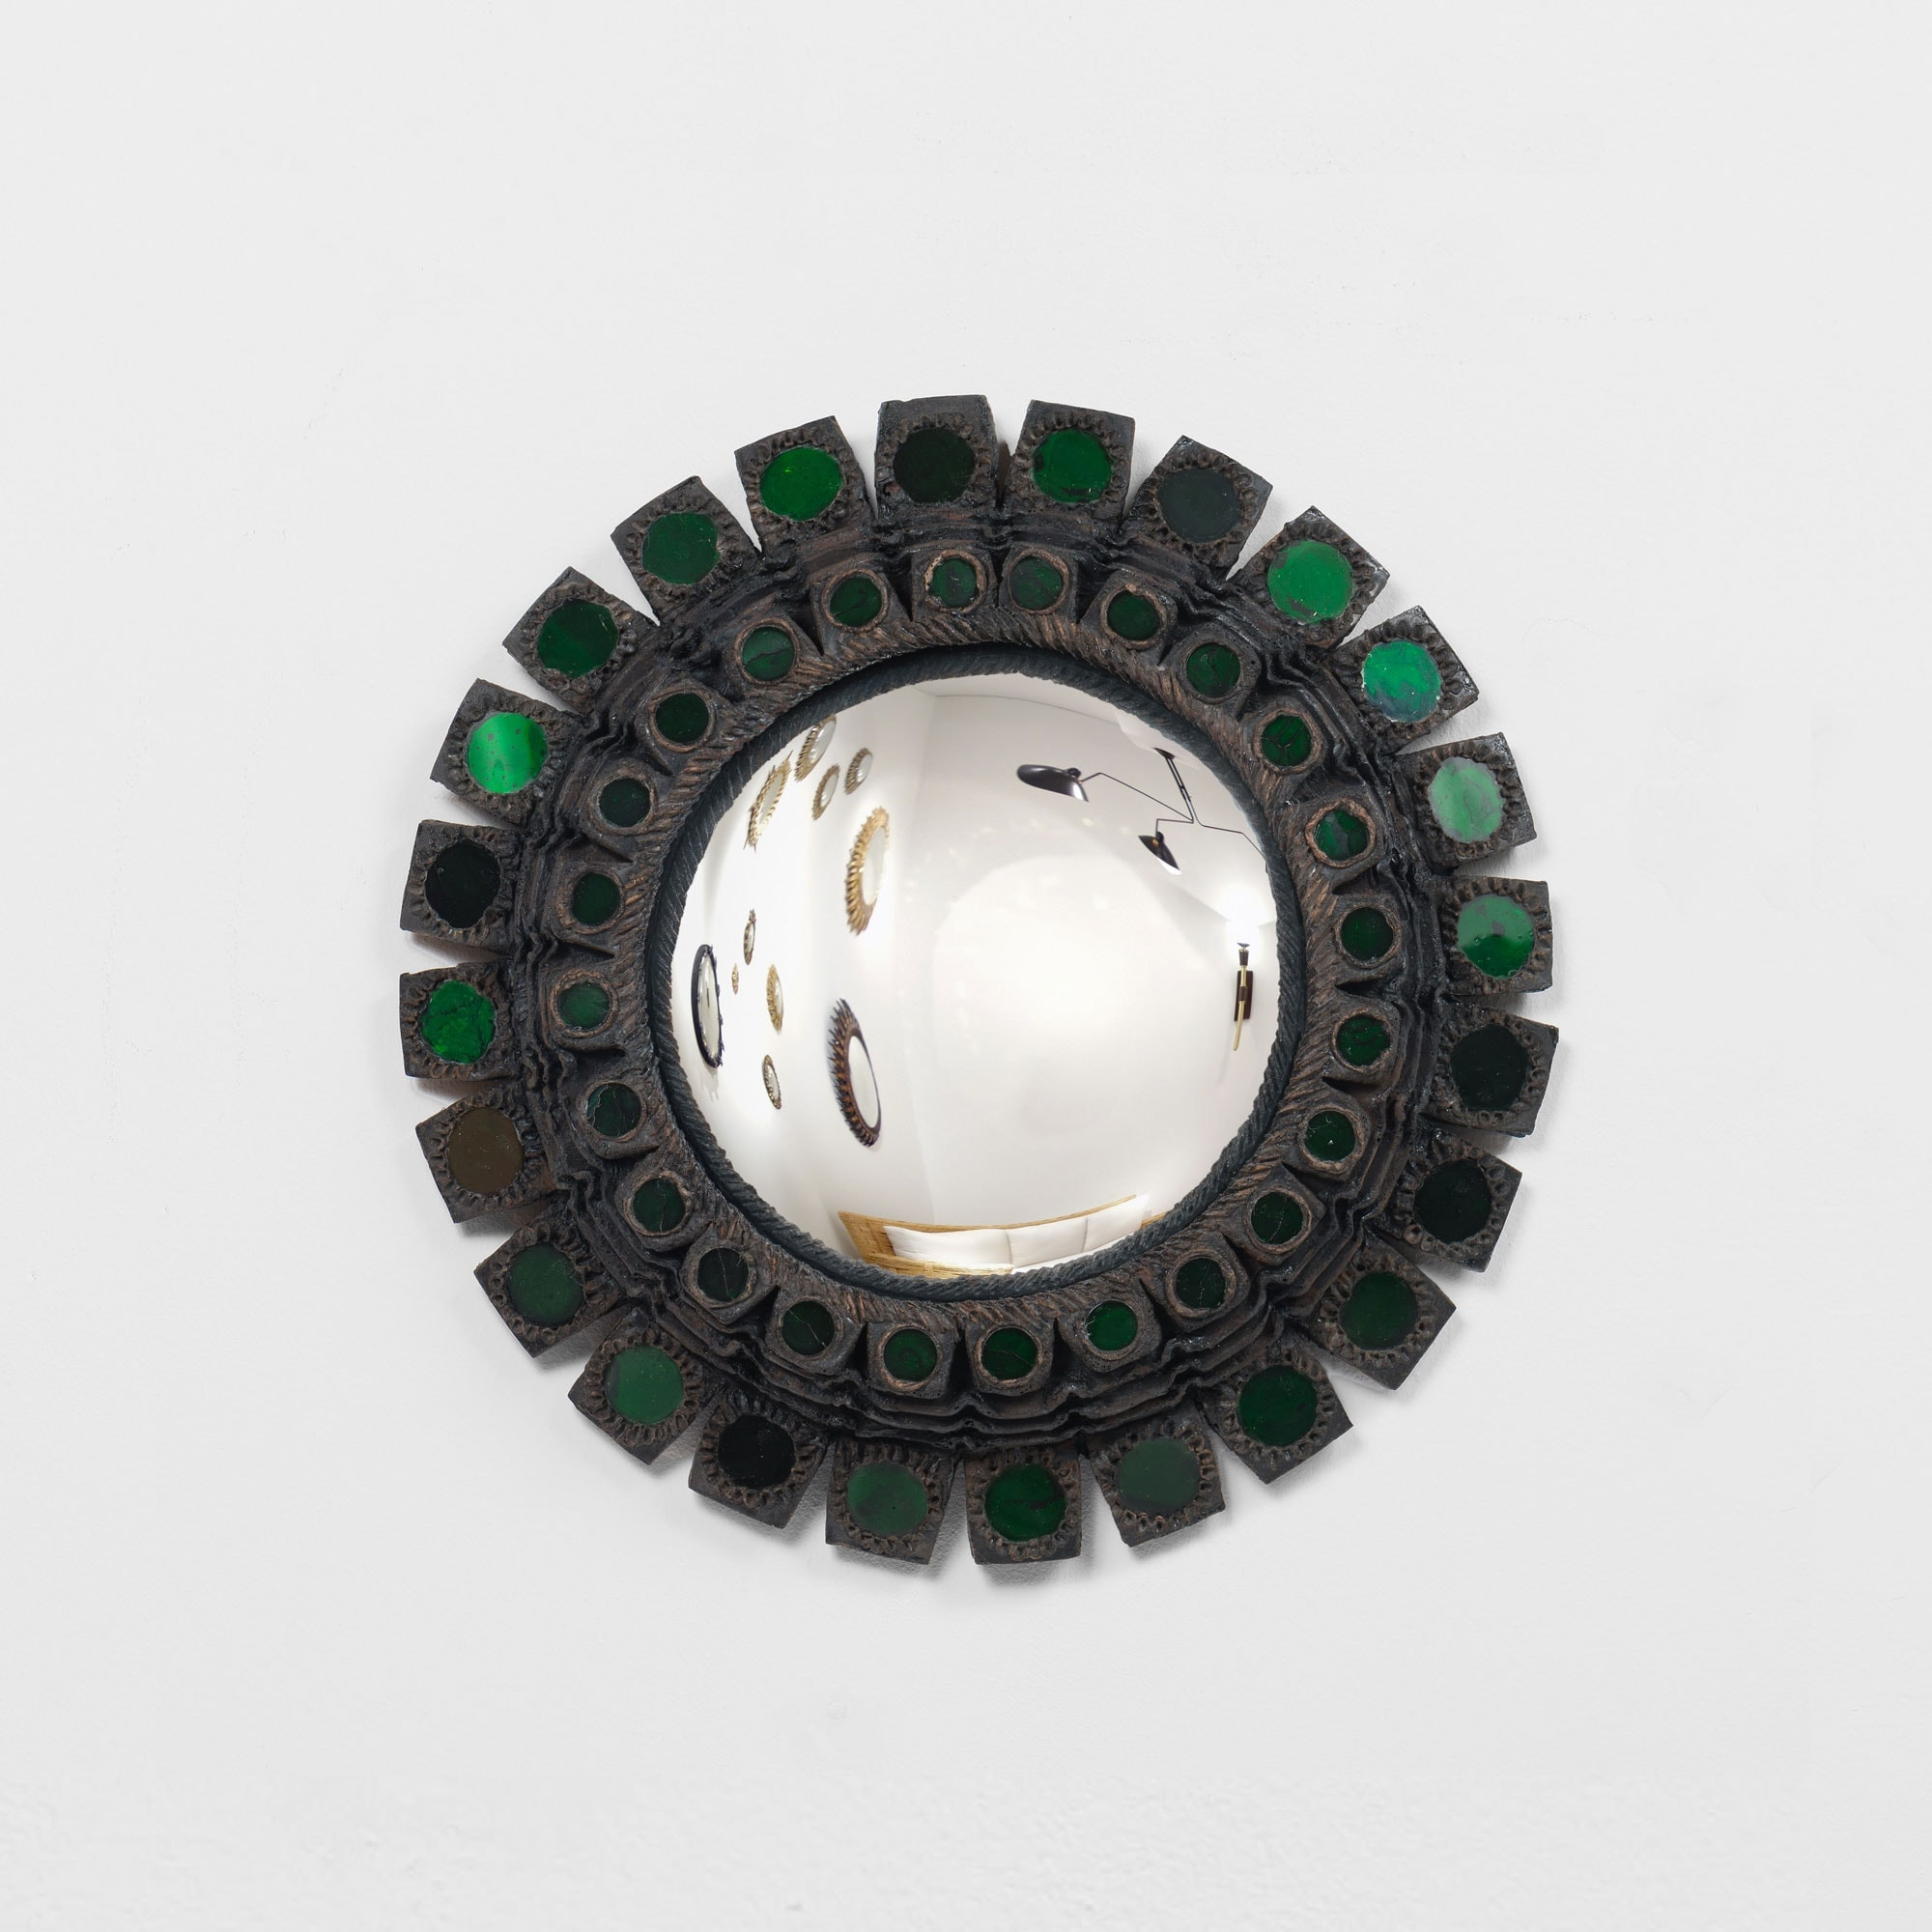 Line Vautrin, Rare mirror (sold), vue 01